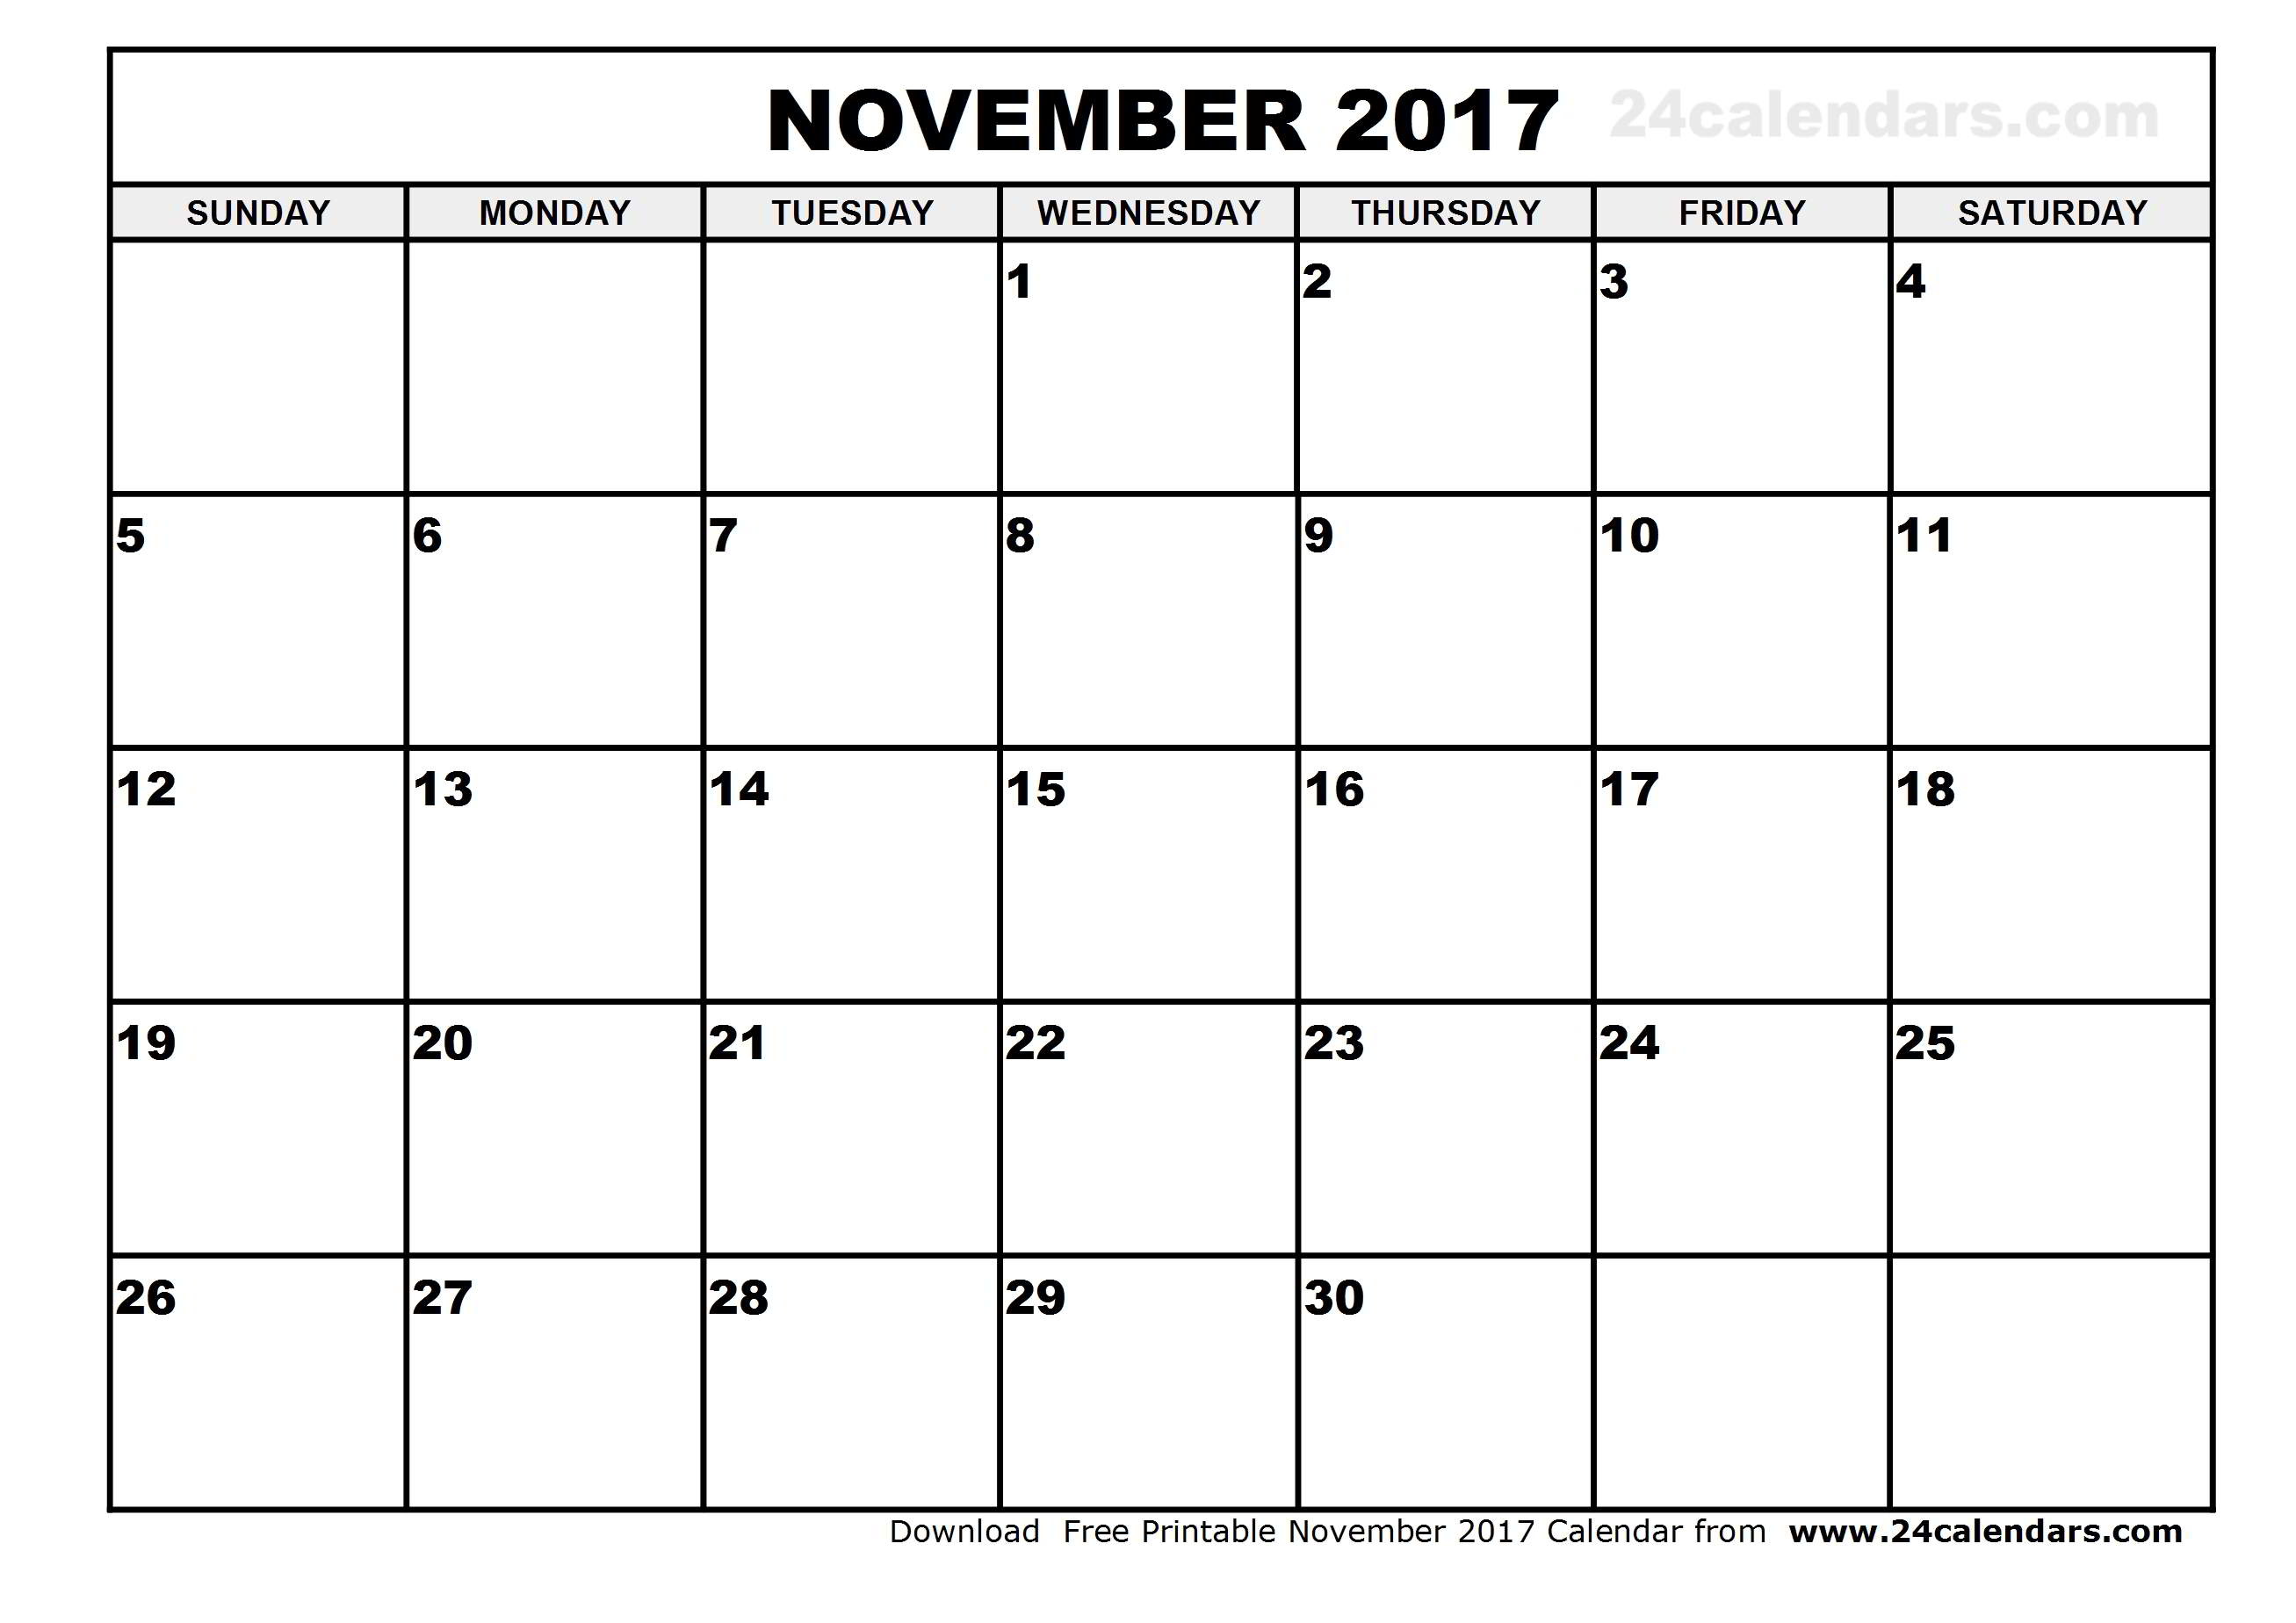 November 2017 Calendar Printable